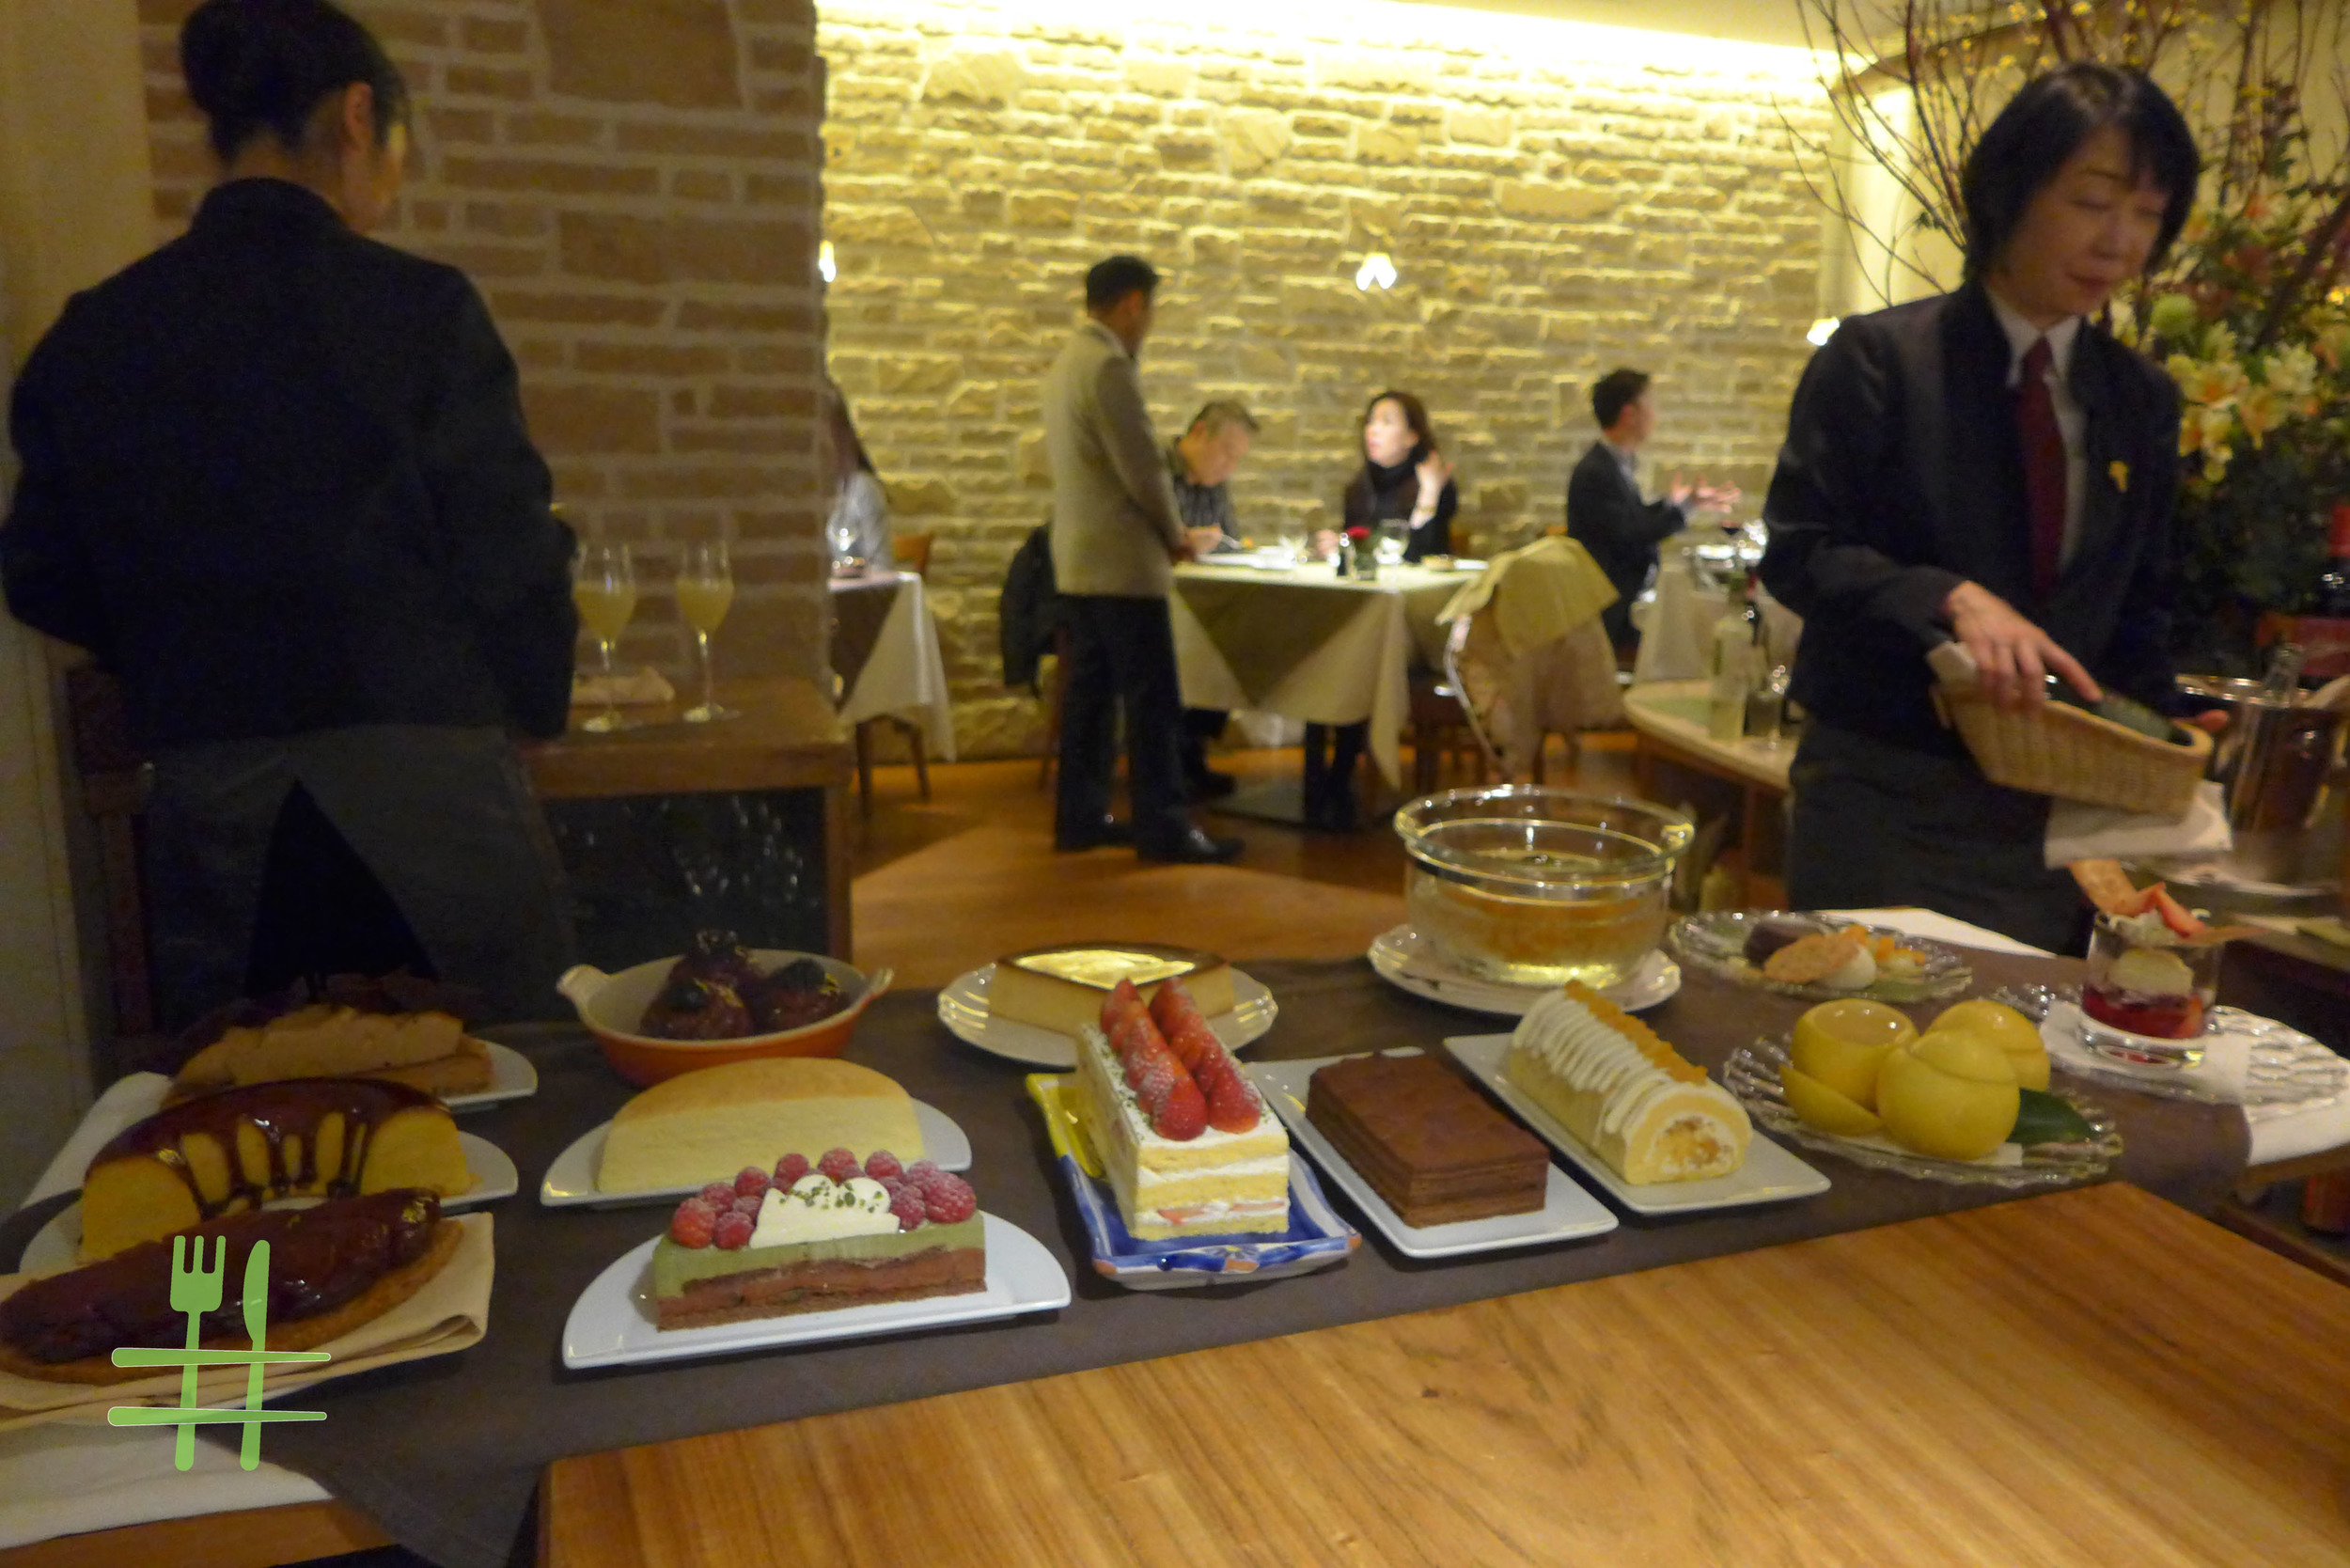 dessert spread.jpg